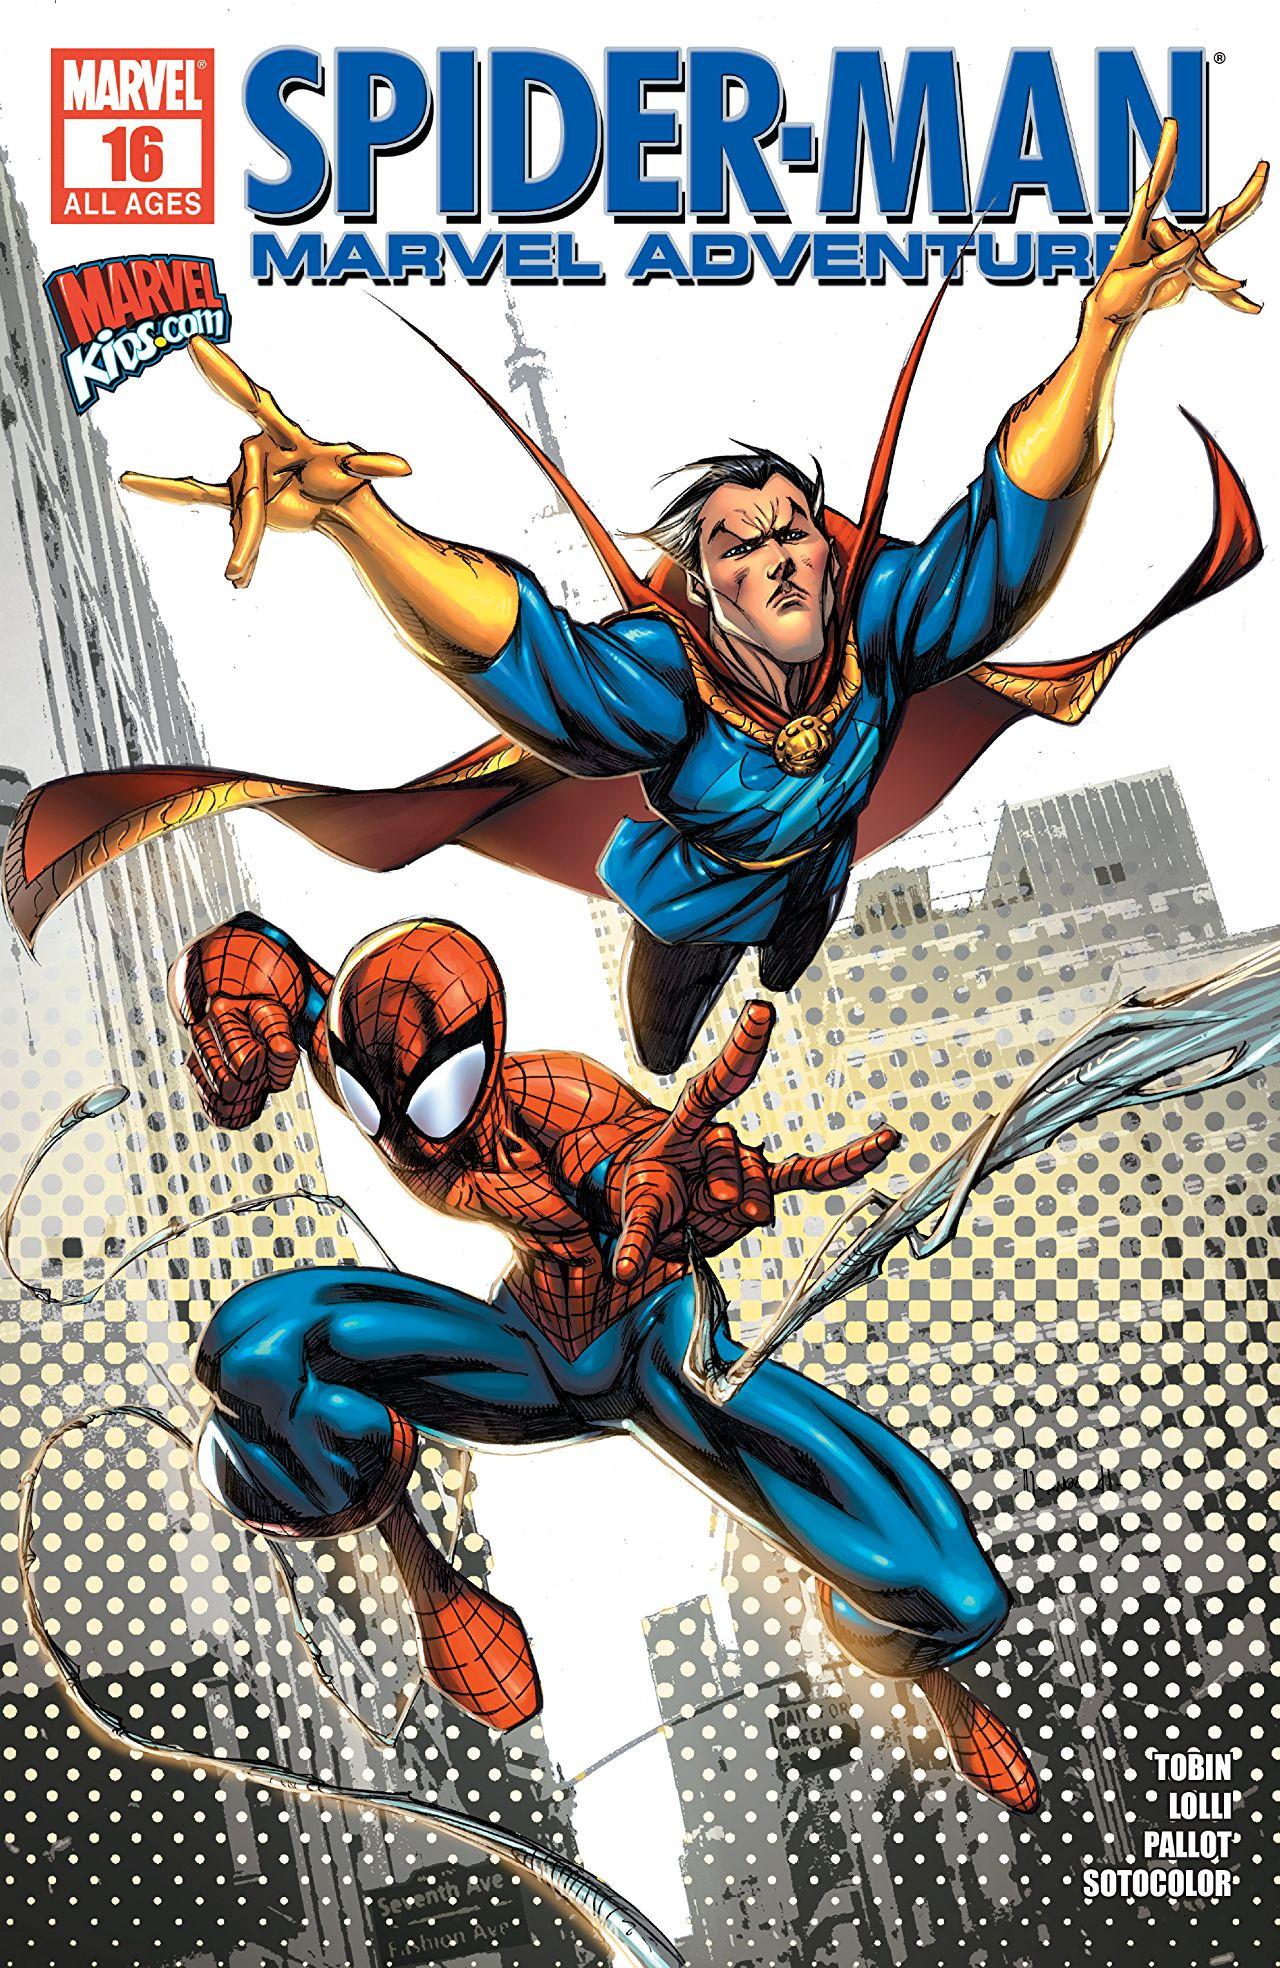 Marvel Adventures Spider-Man Vol 2 16